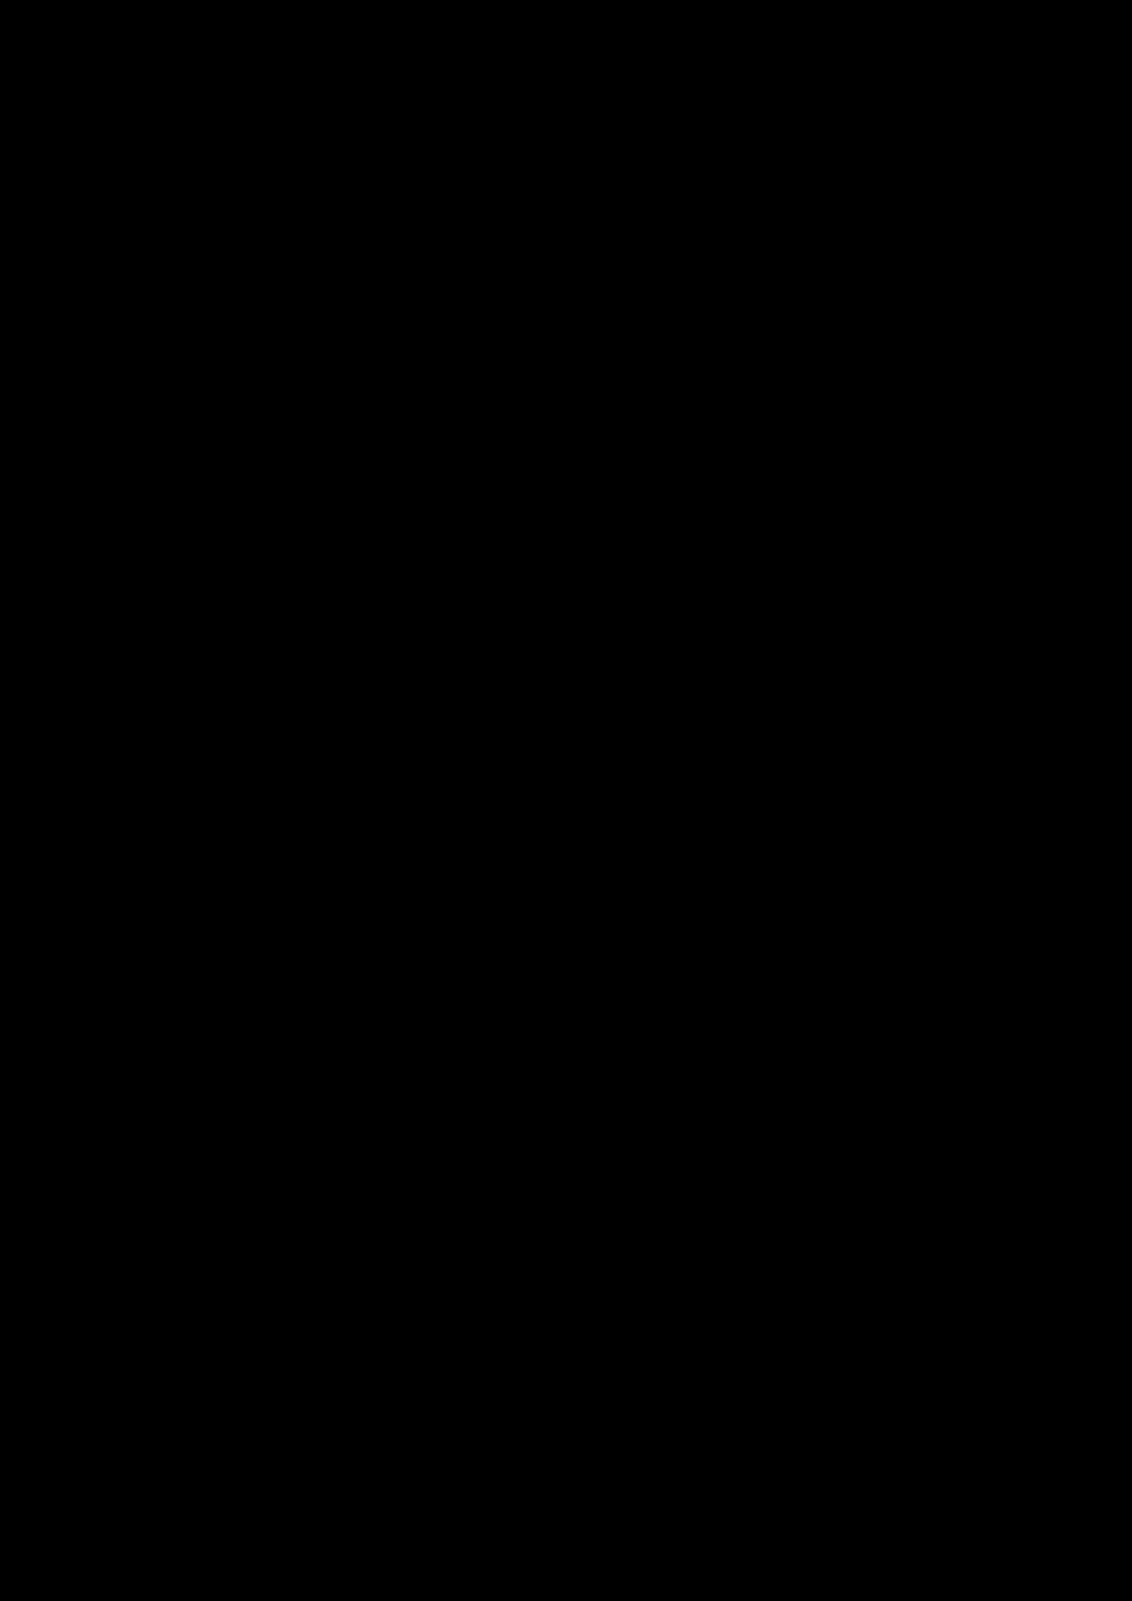 Prosti slide, Image 7